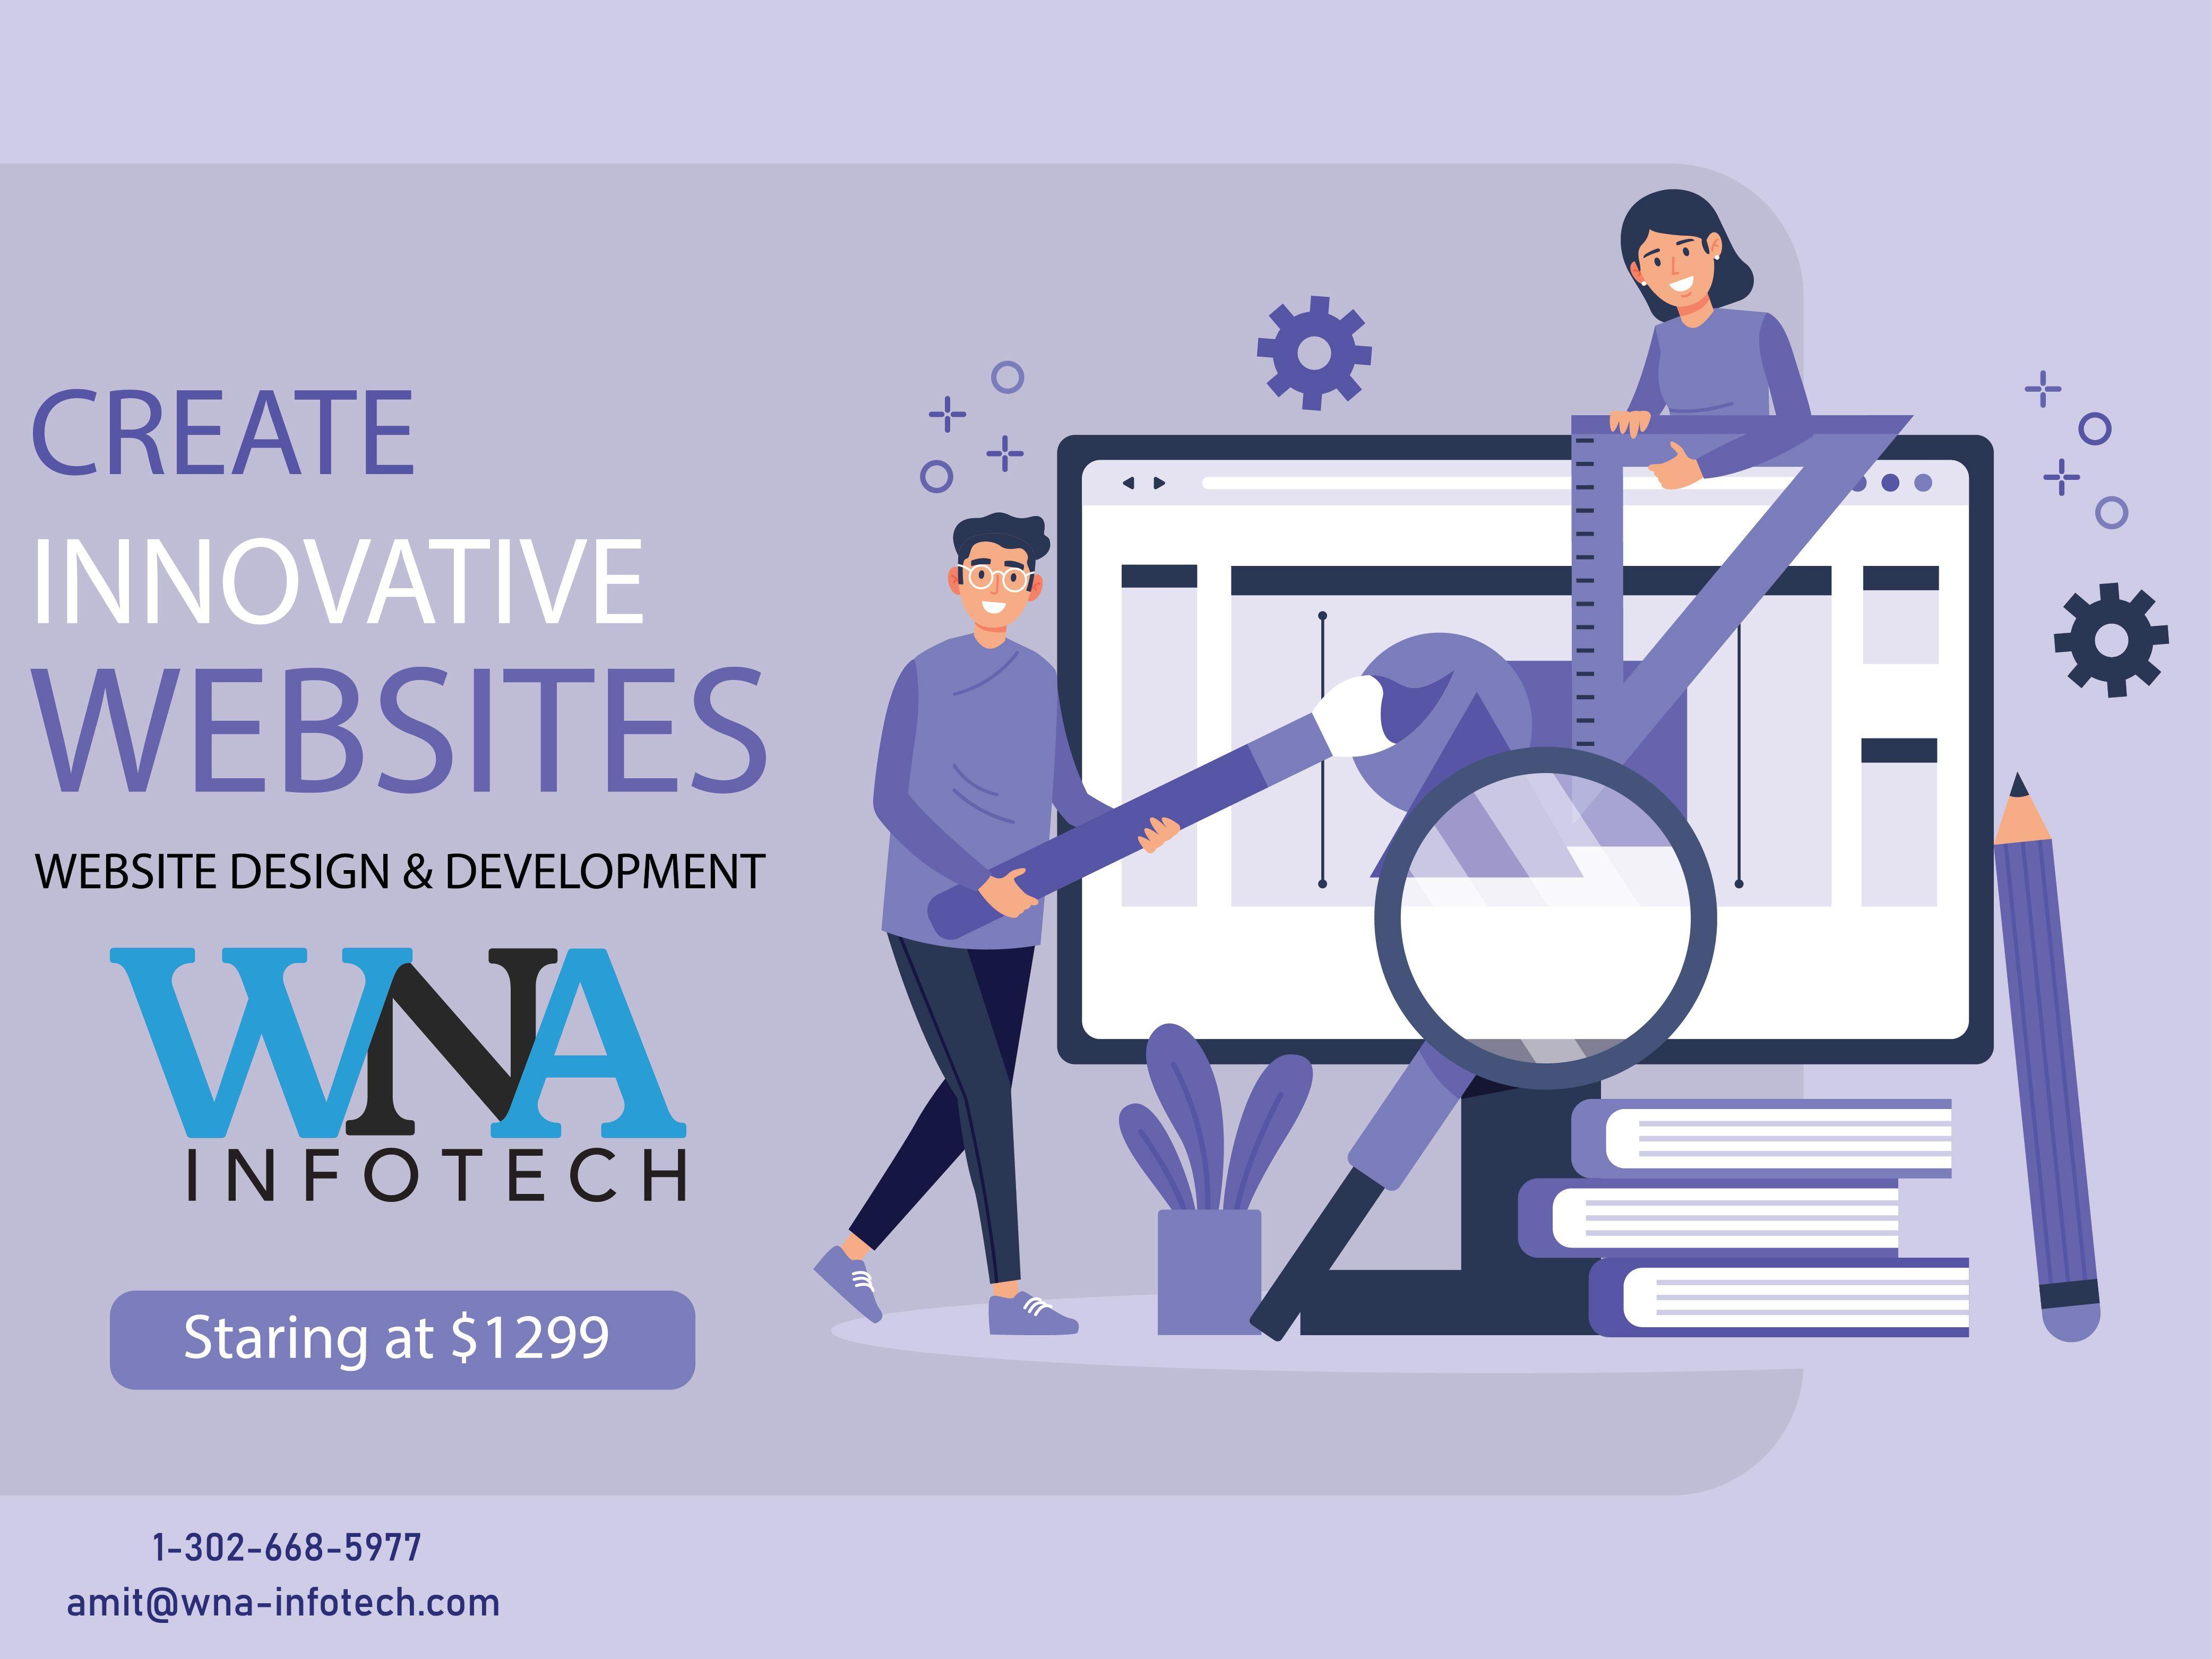 Get An Innovative Website Design Development Company Who Can Provide The Custom Web Services W In 2020 Innovative Websites Web Development Design Design Development